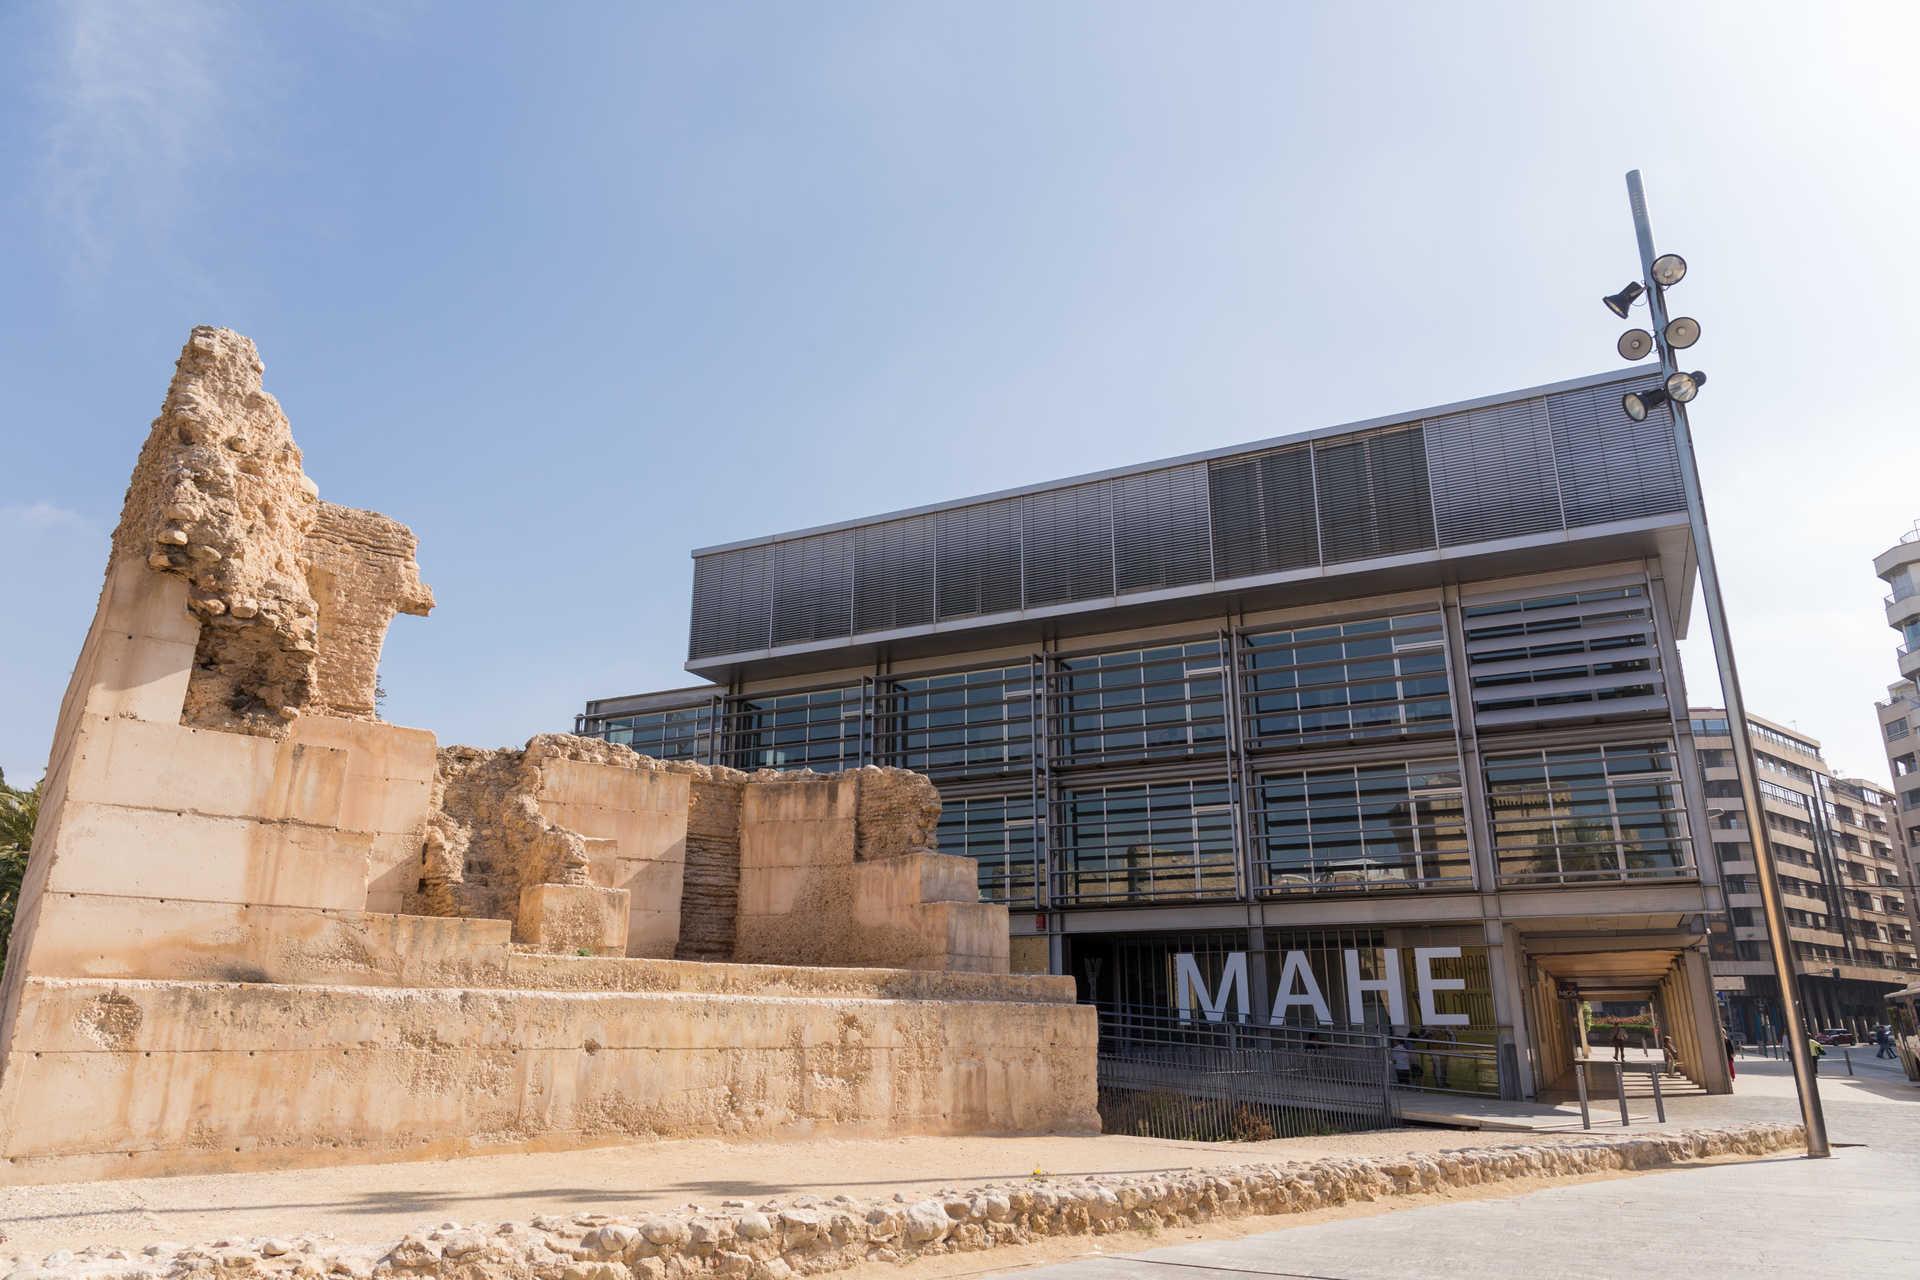 Museu Arqueològic i d'Història d'Elx (MAHE)